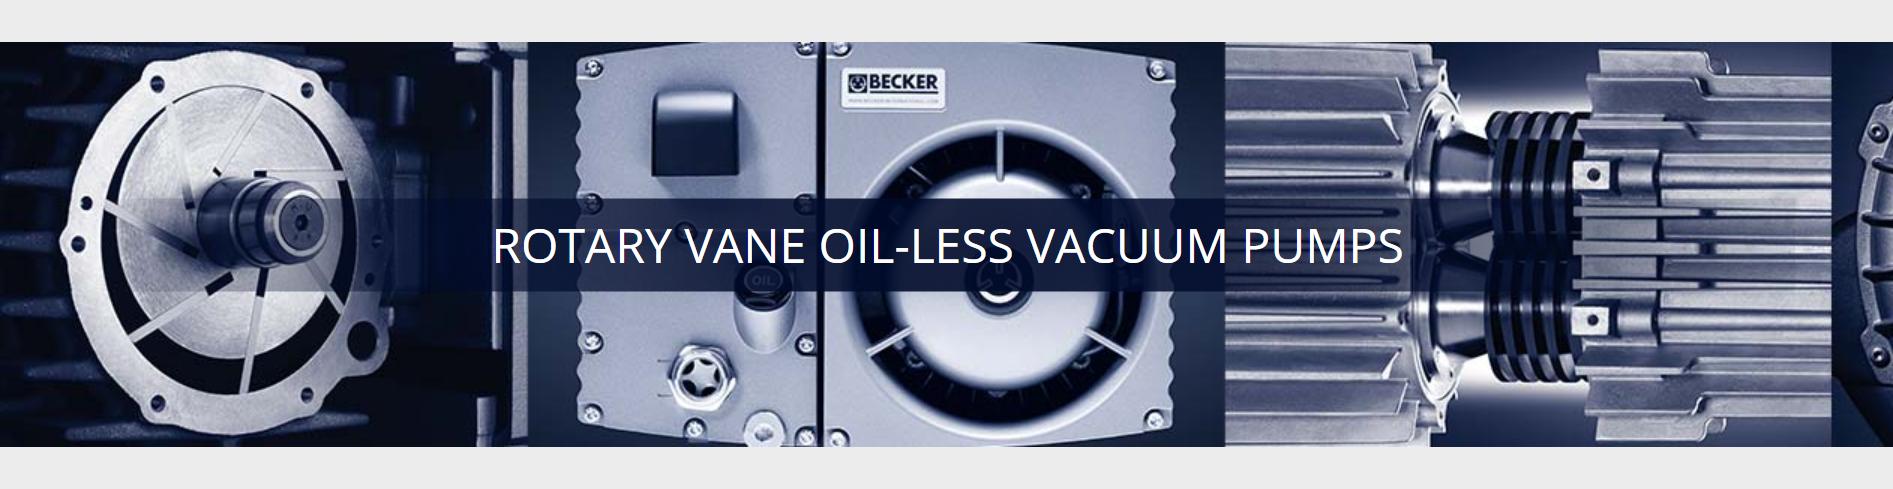 Oil-less rotary vane vacuum pumps.